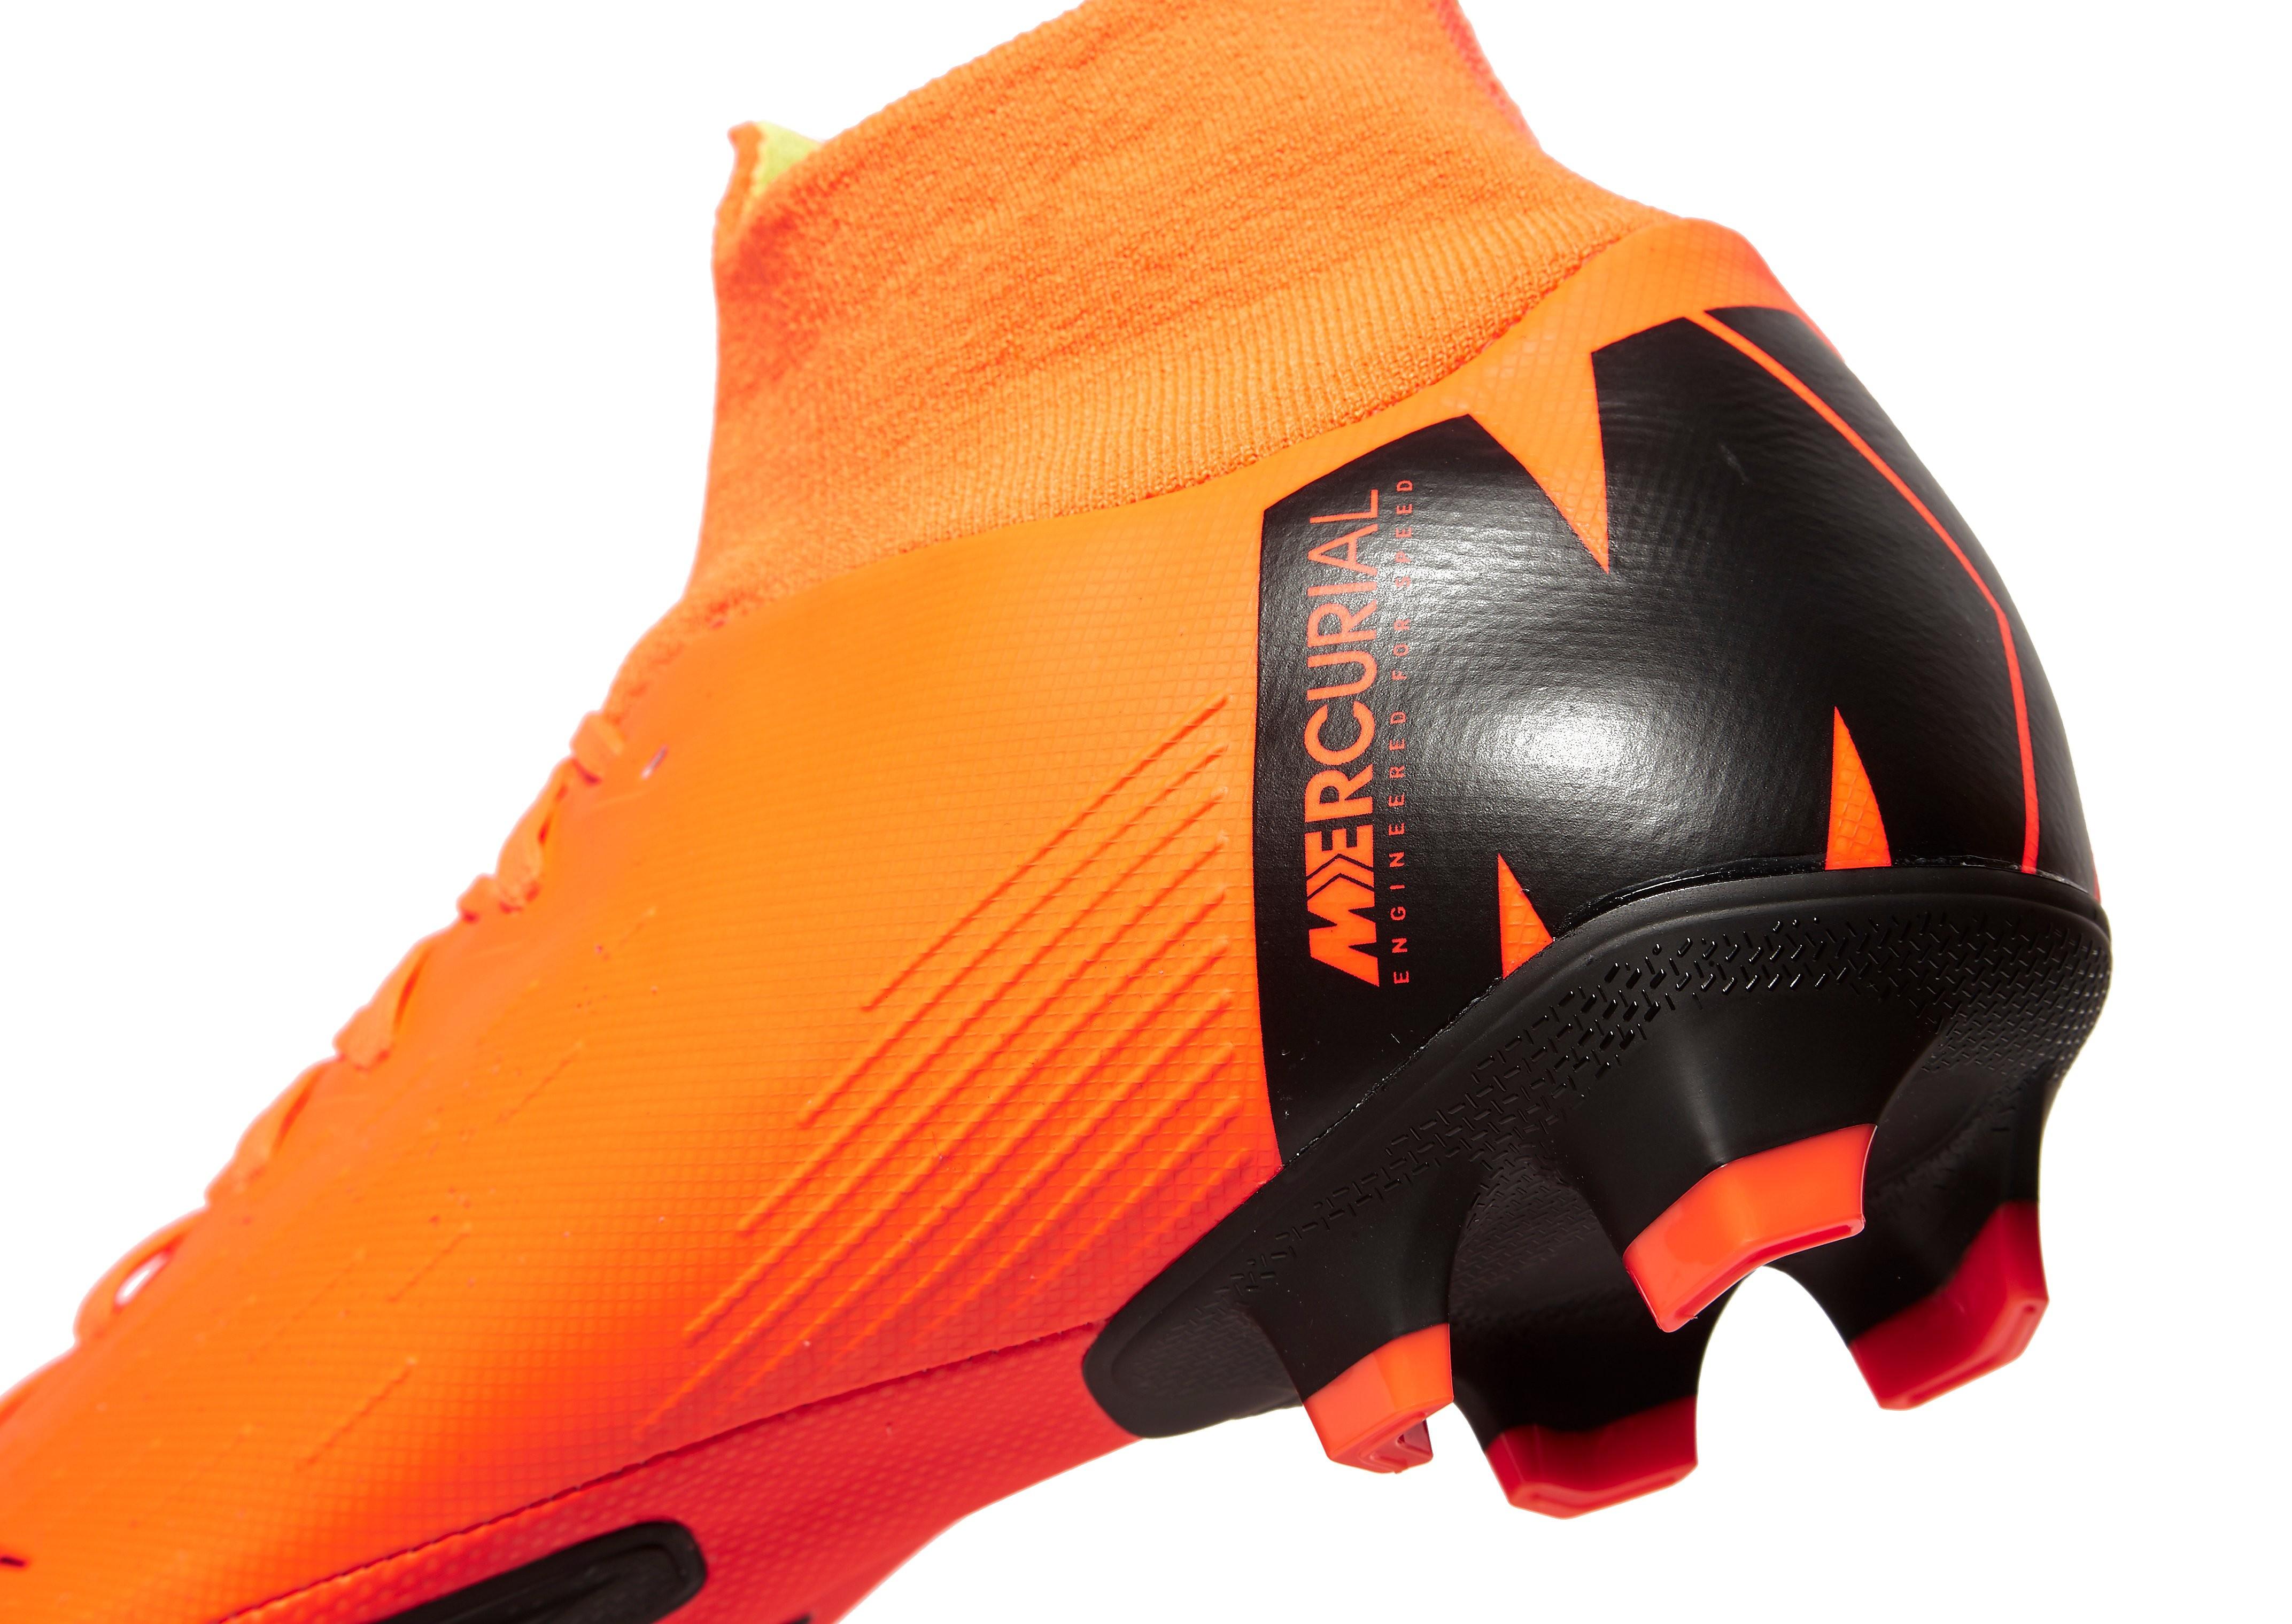 Nike Mercurial 360 Elite Dynamic Fit FG Homme